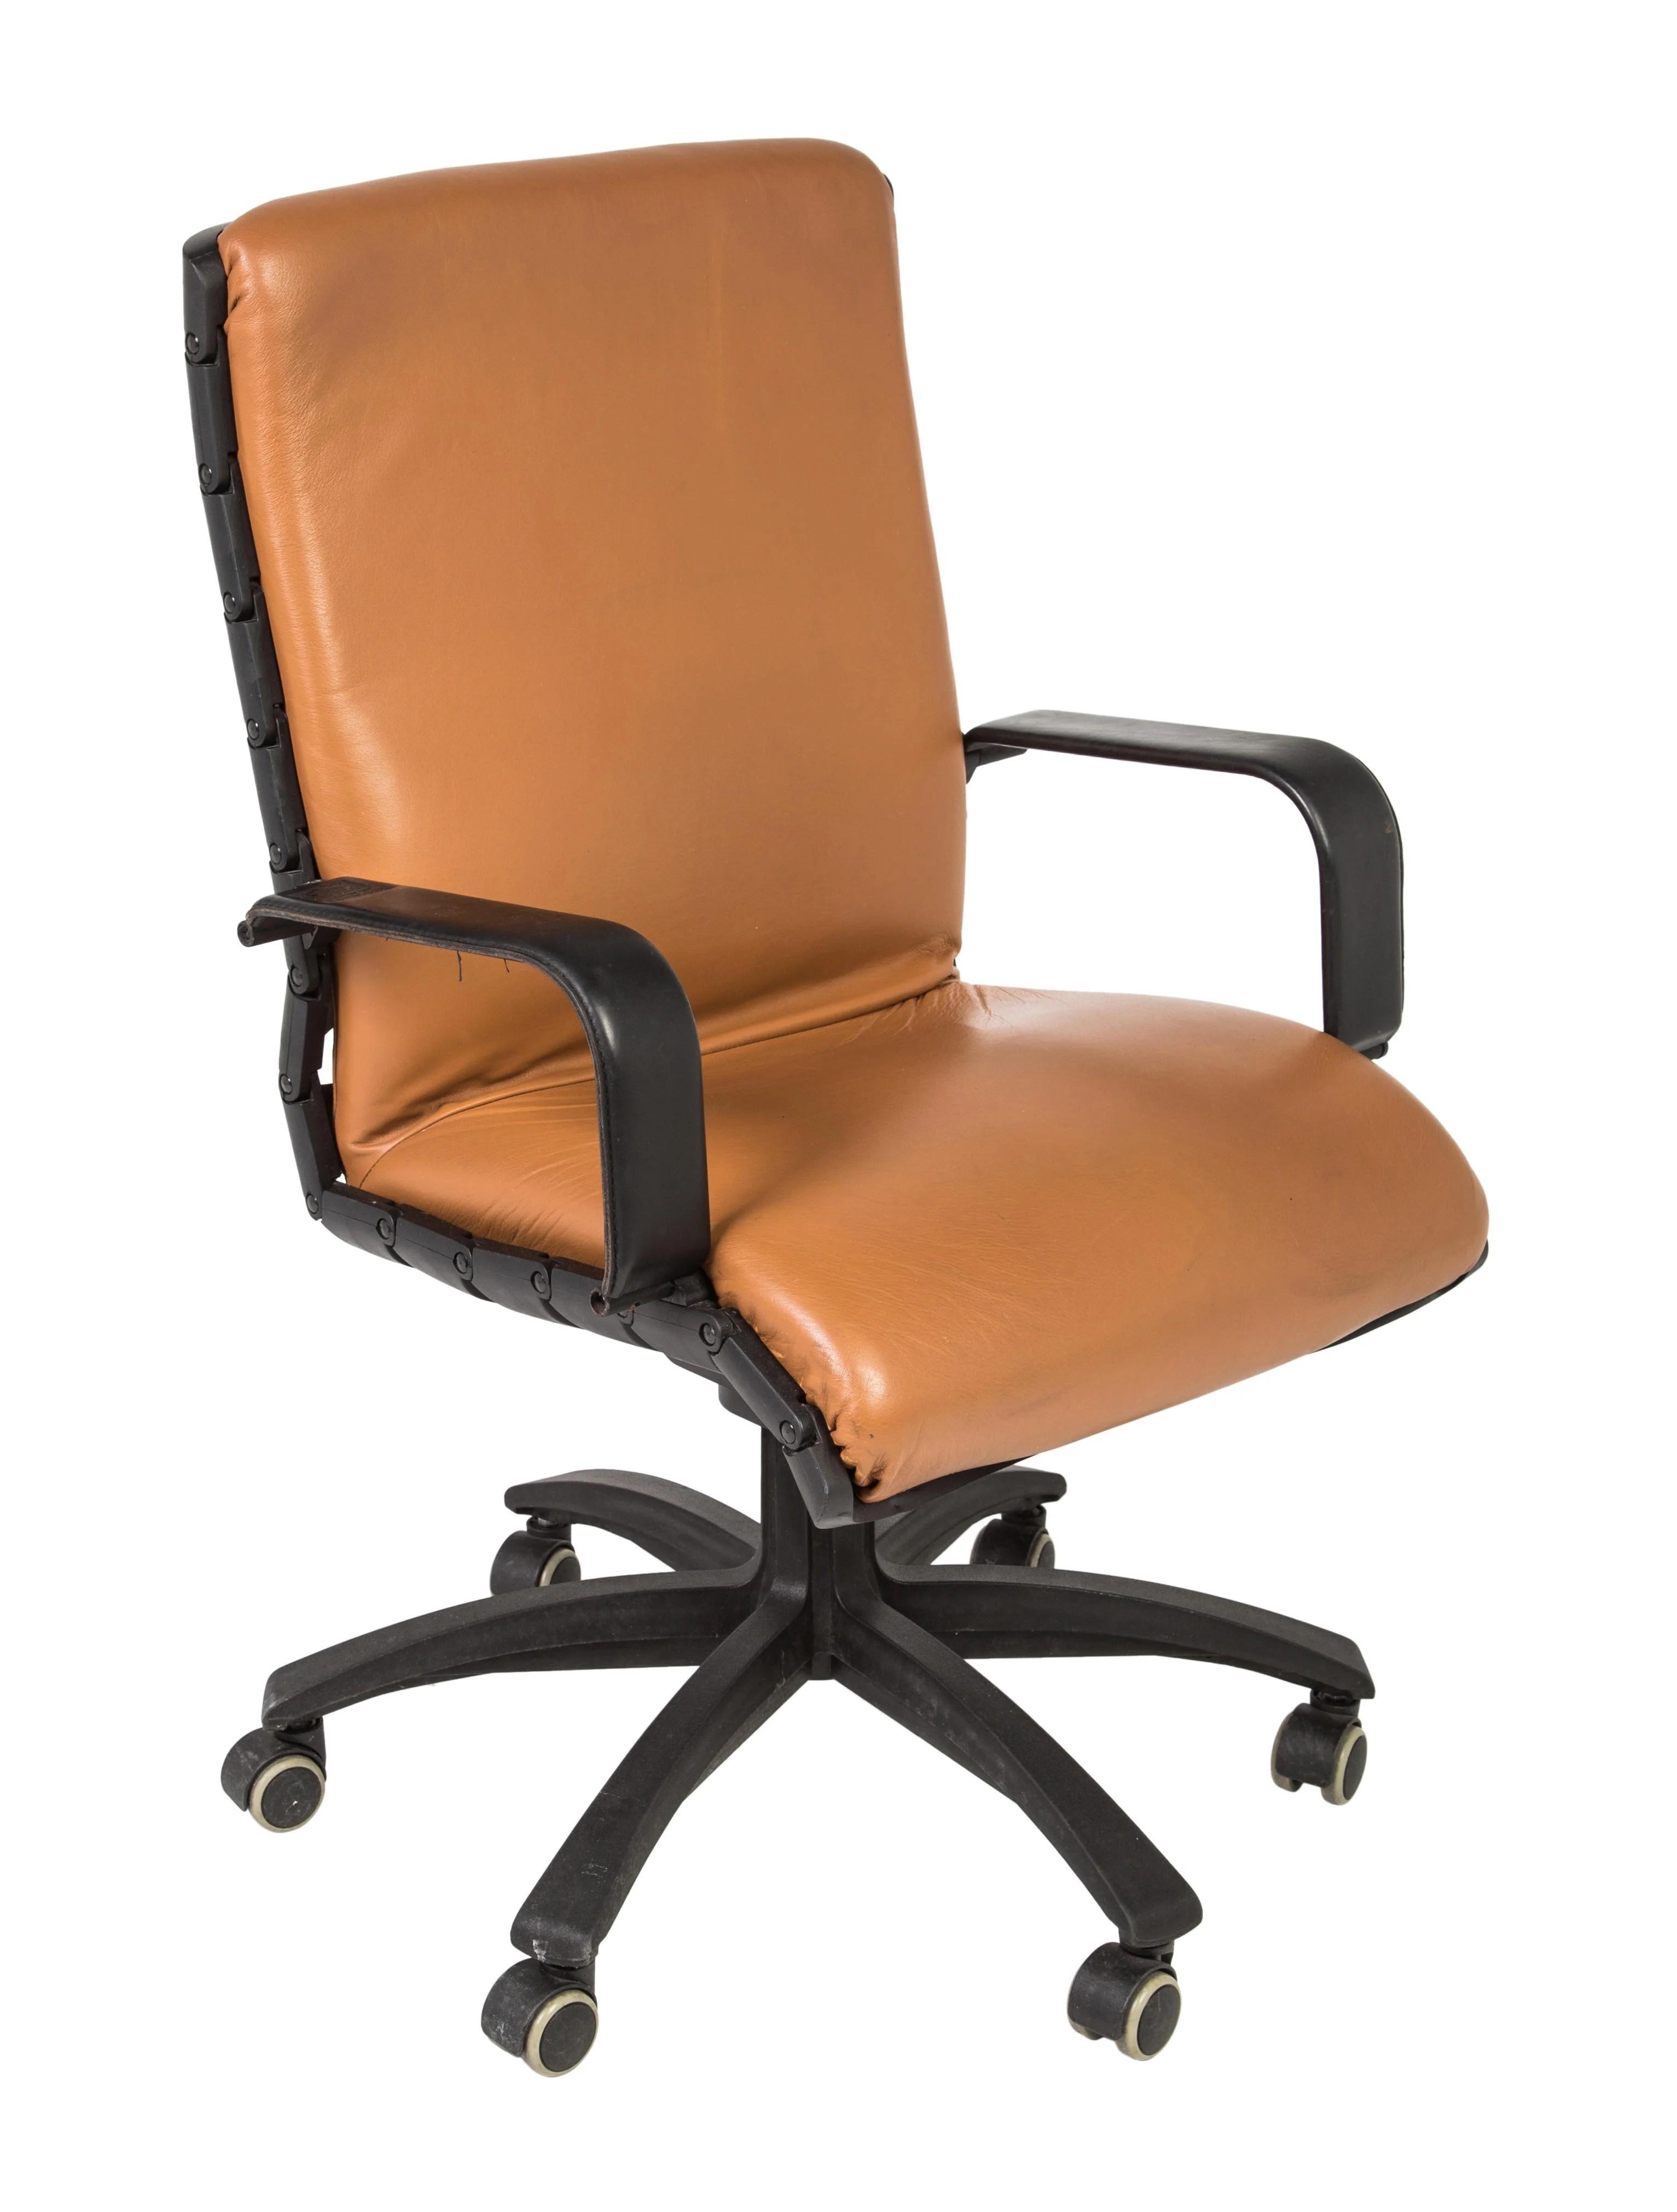 ferrari office chair chairs for handicapped poltrona frau cockpit